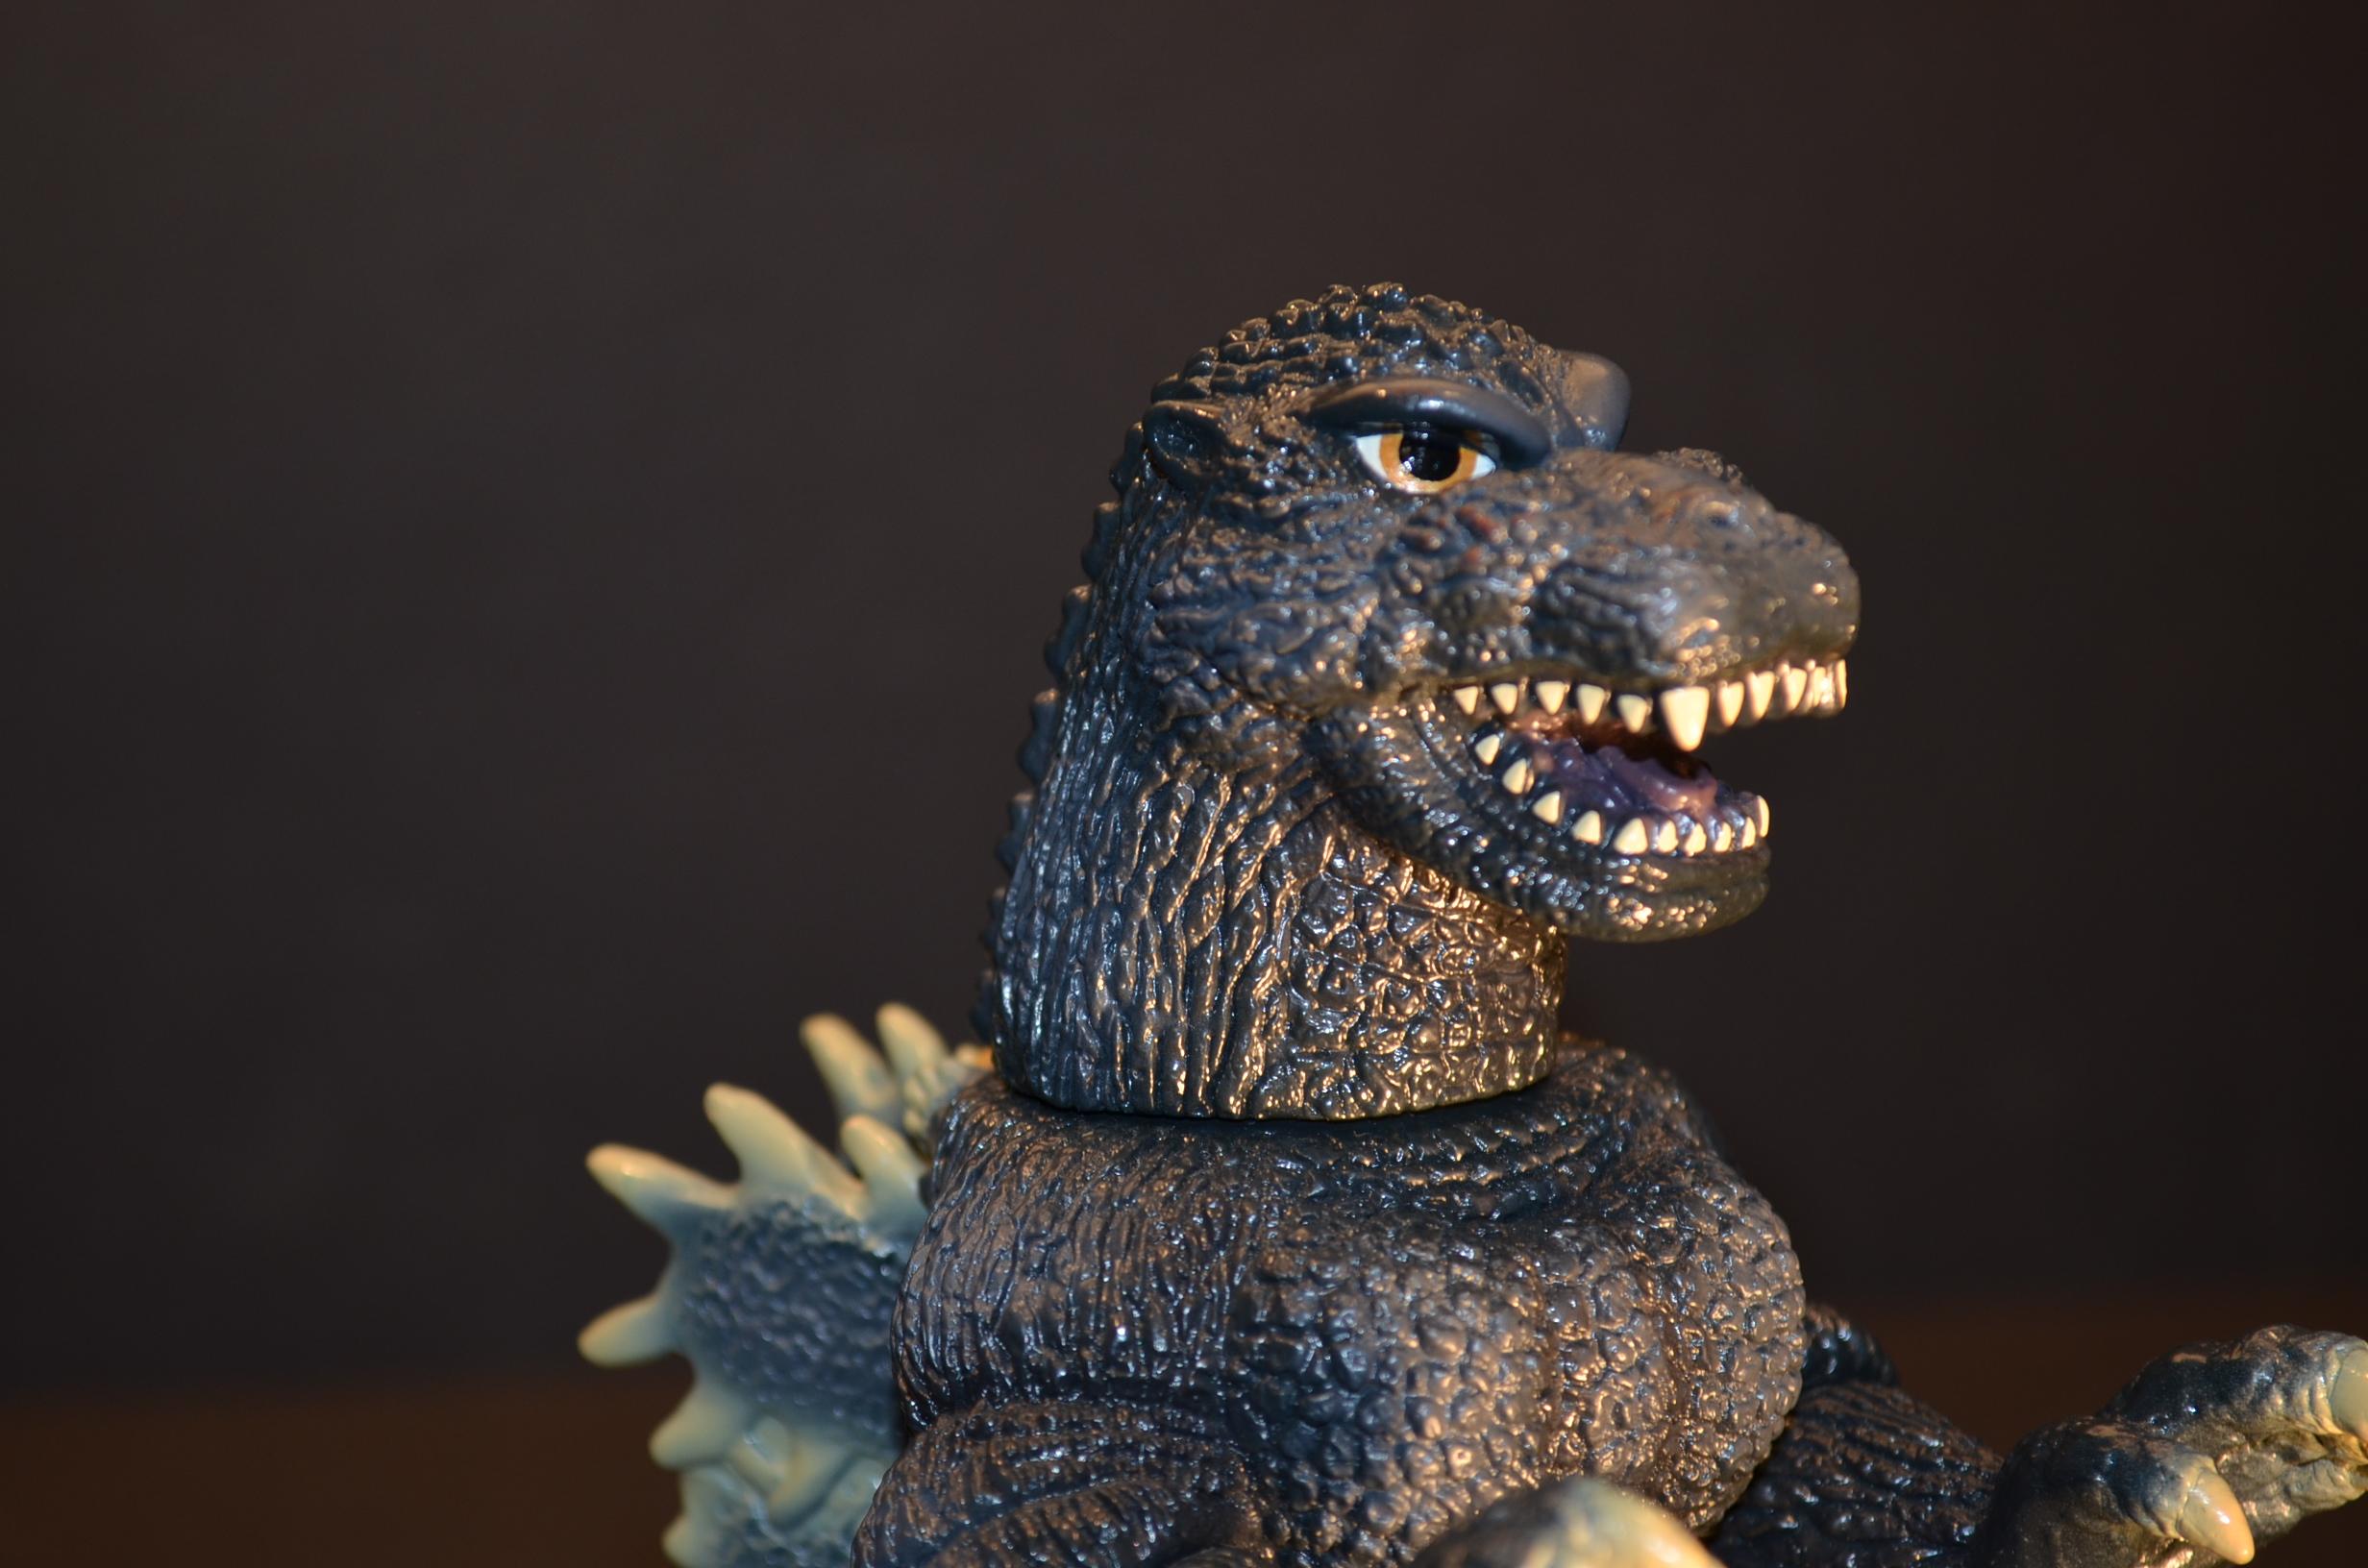 Godzilla 1991 Hazawa Gumi Gray No Bag Loose Clawmark Toys